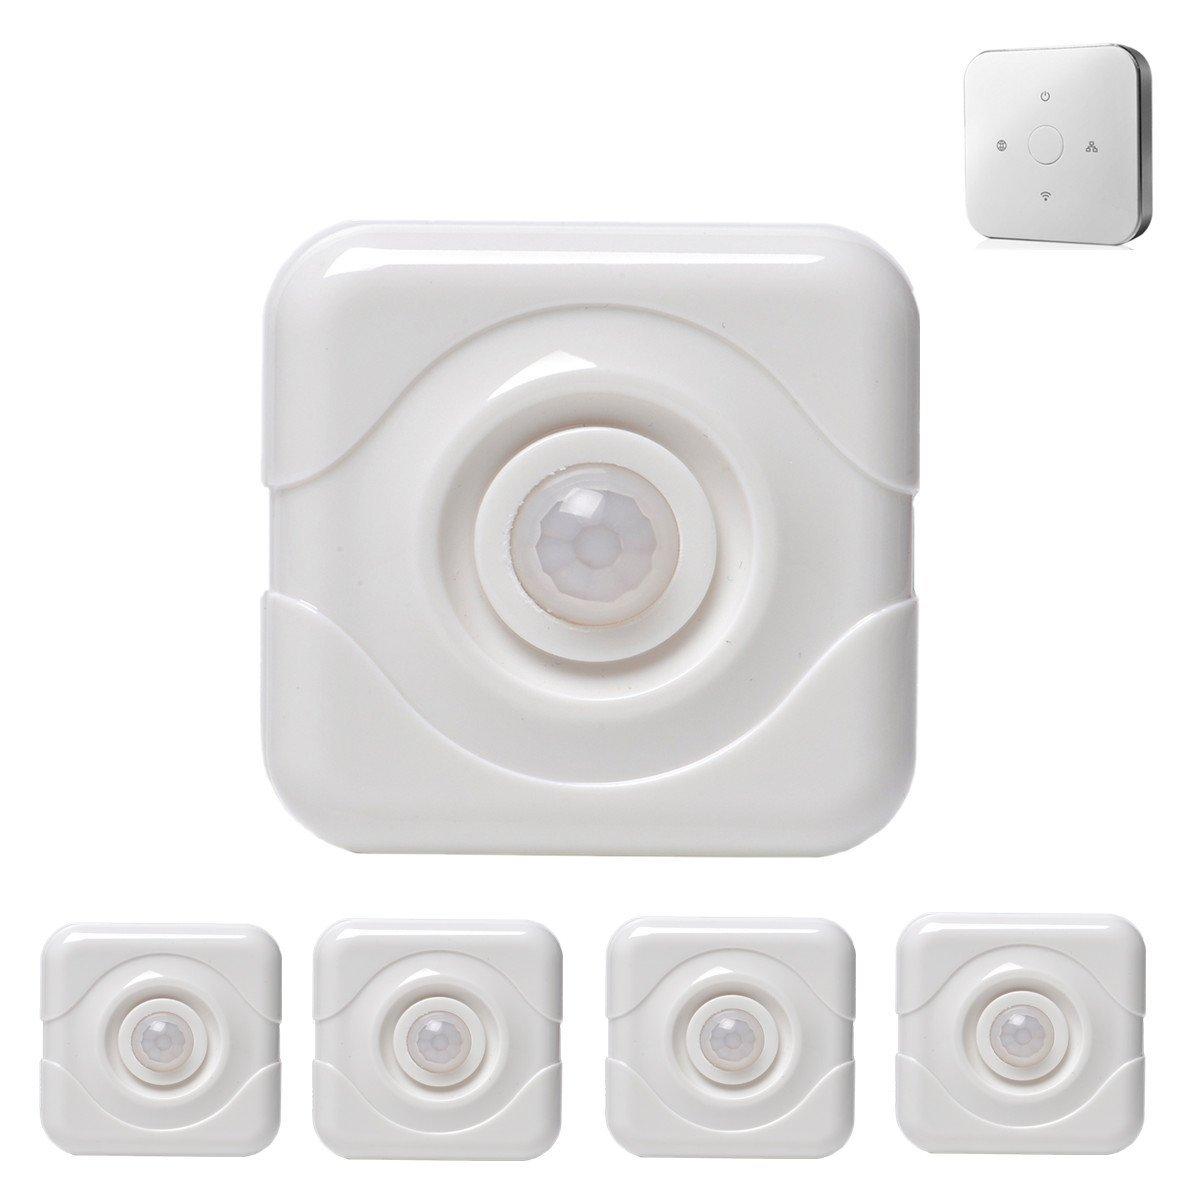 iHomeware Wireless PIR Motion Sensor, Zigbee Home Automation Sensor 5/pack with Gateway